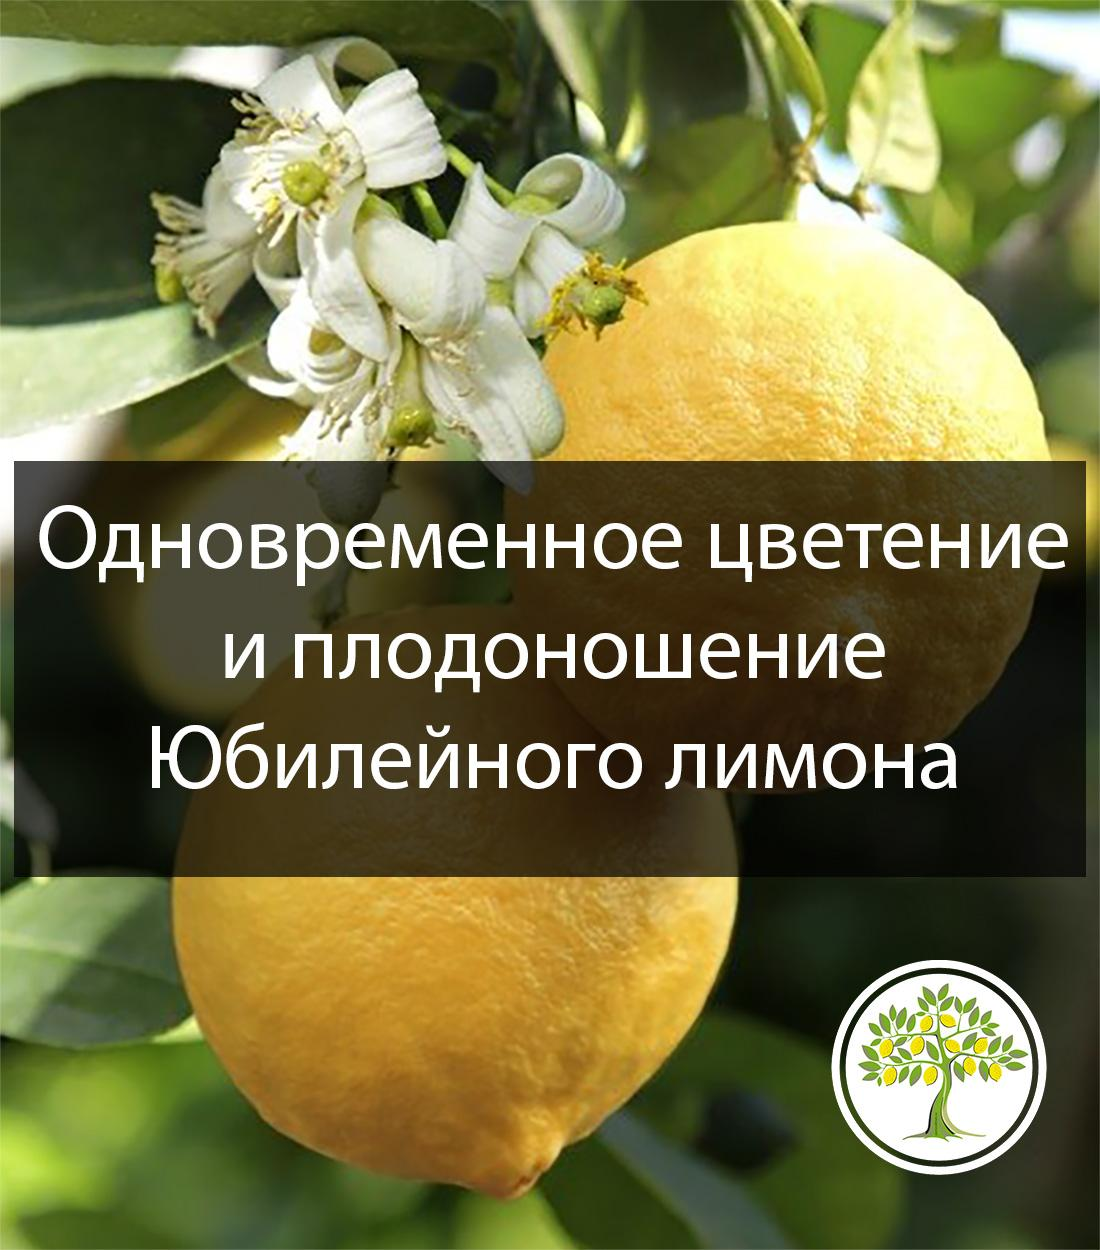 Лимон юбилейный с плодом фото